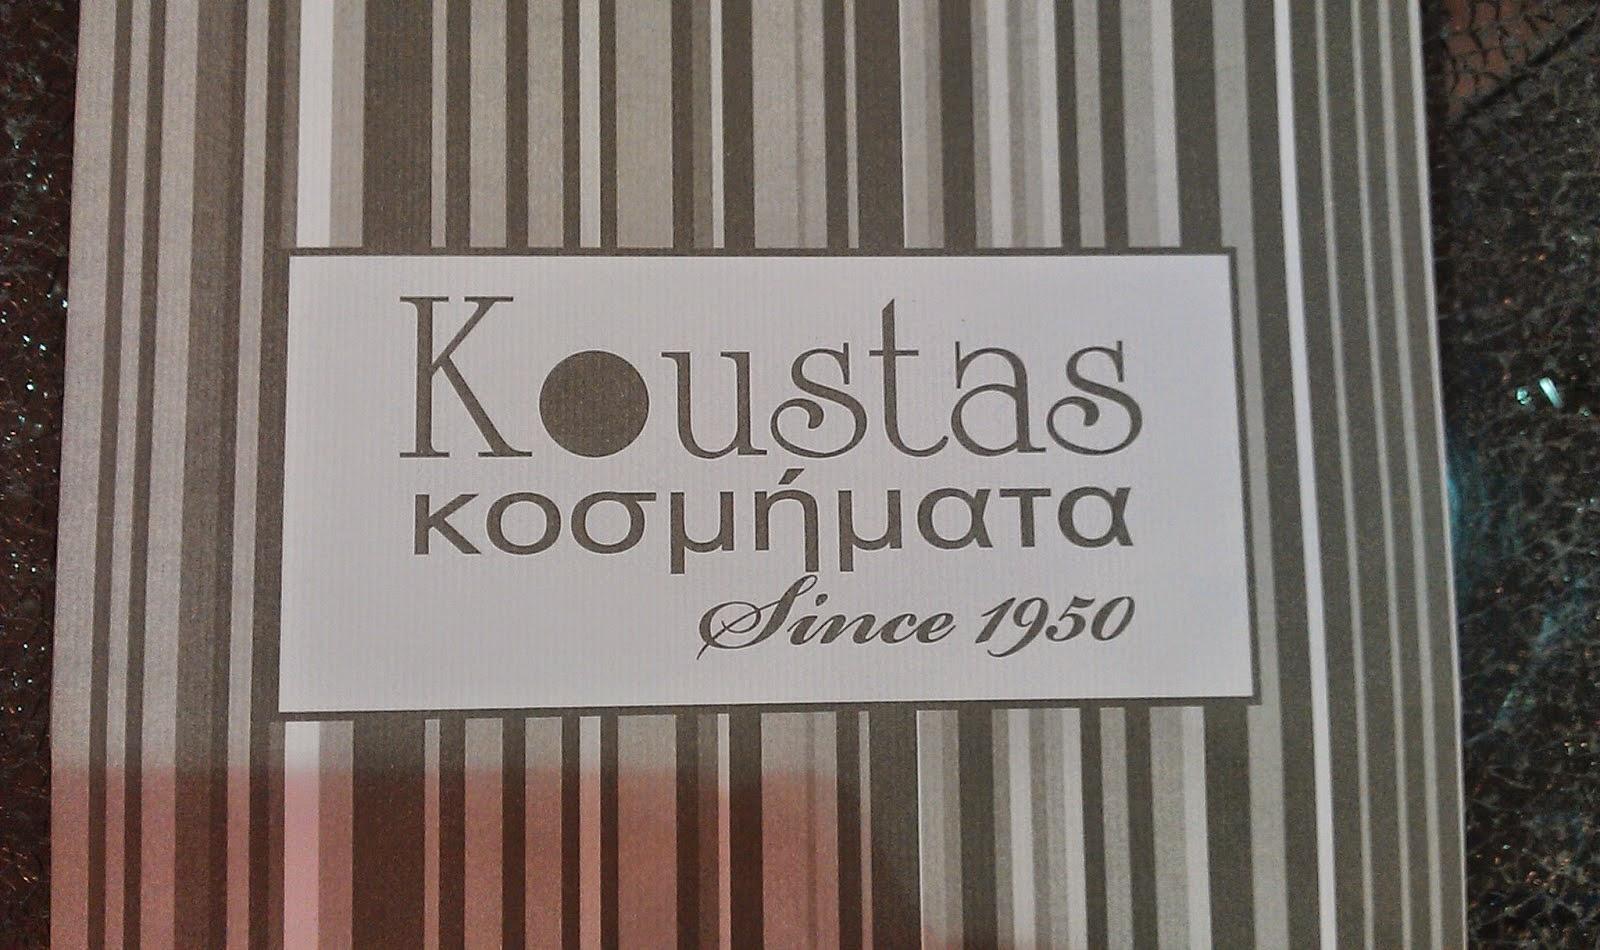 KOUSTAS ΚΟΣΜΗΜΑΤΑ